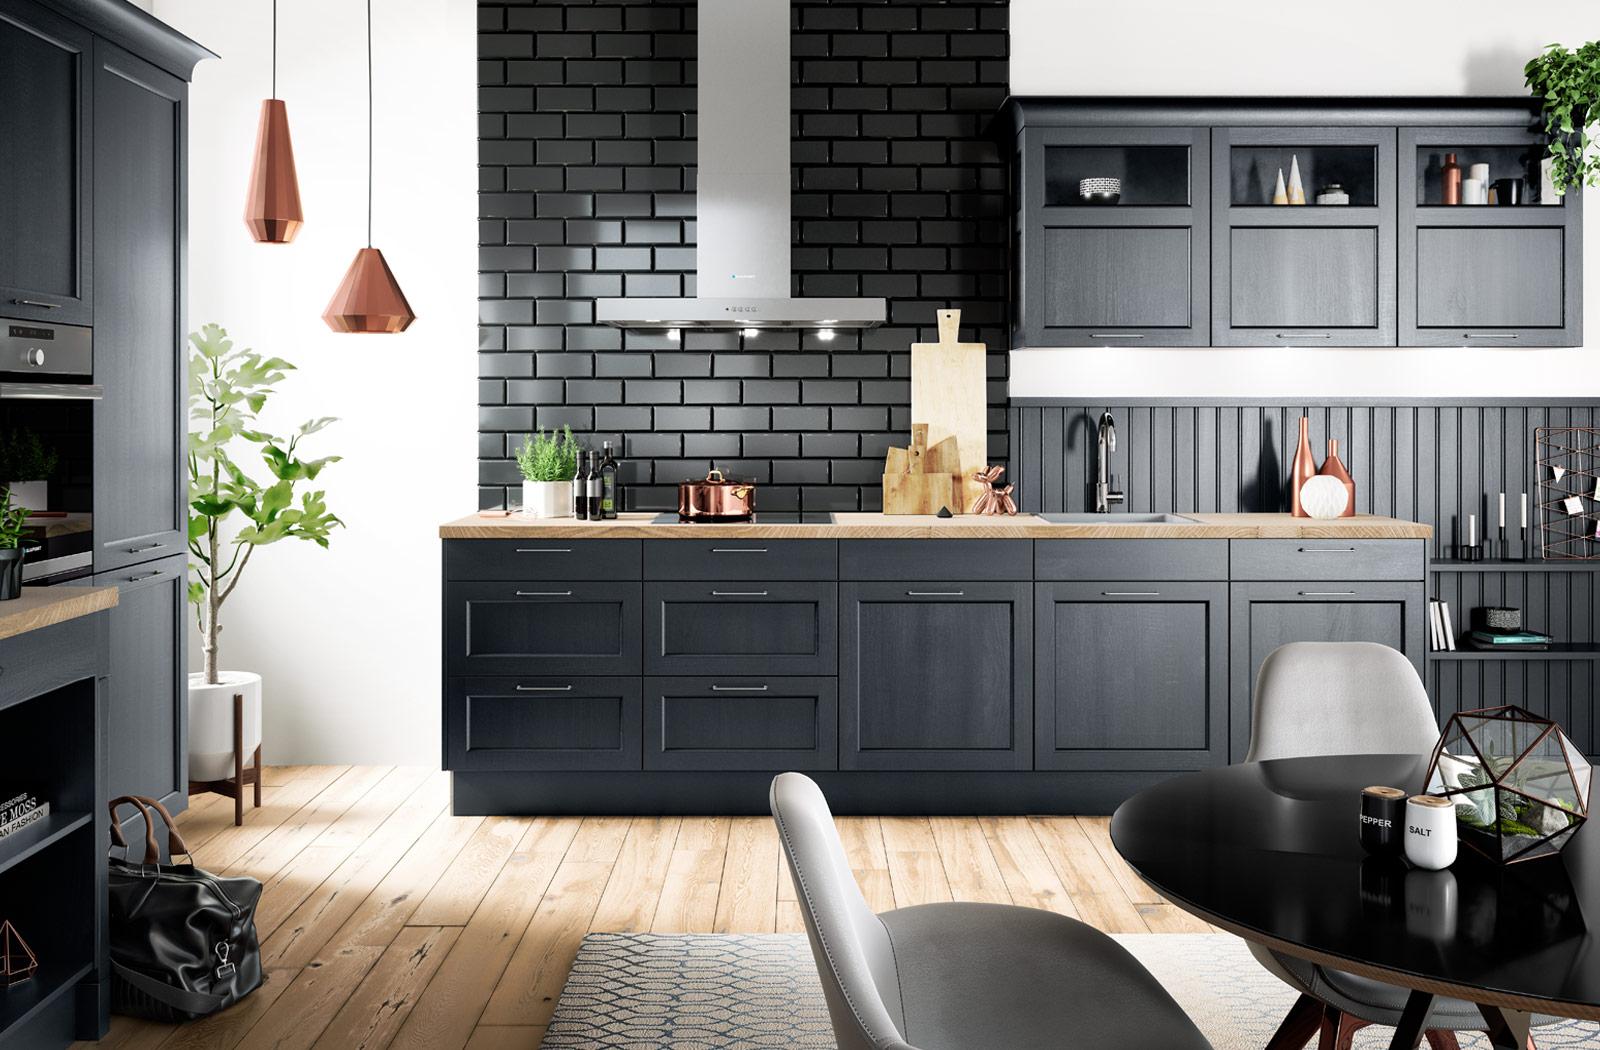 Full Size of Moderne Country Küche Moderne Küche Kaufen Moderne Küche Farben Moderne Küche Wandfarben Küche Moderne Landhausküche